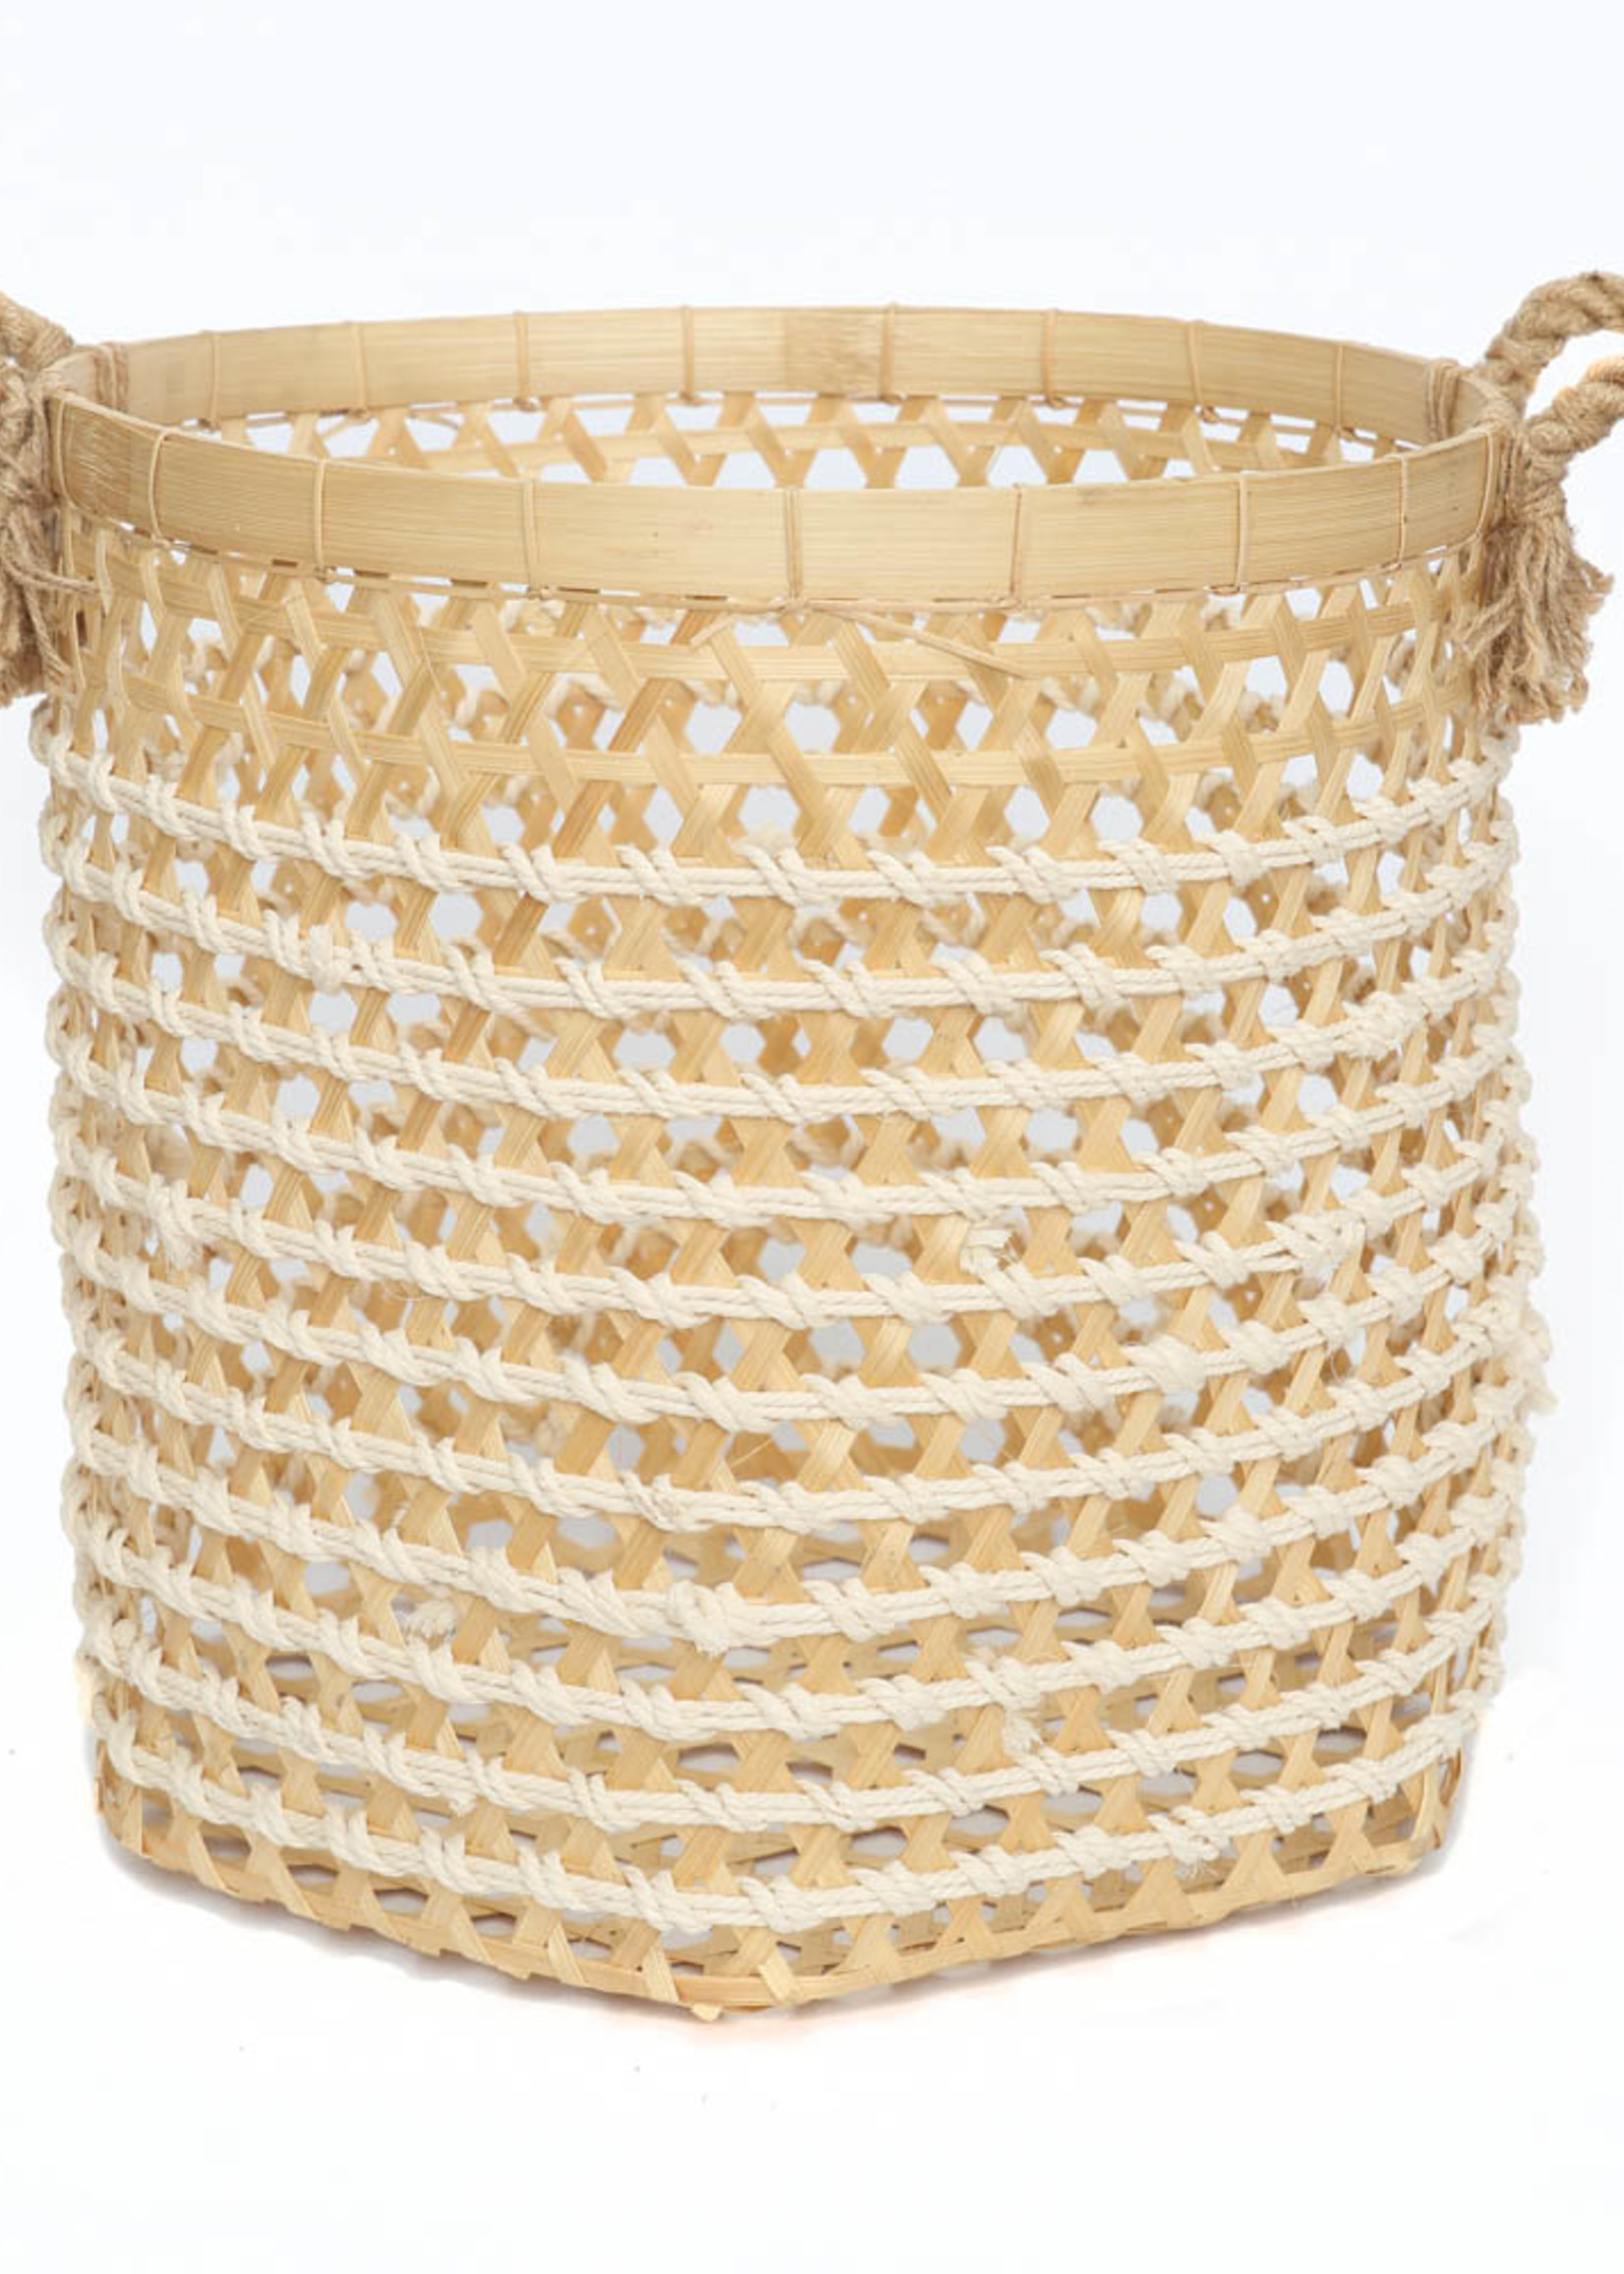 The Bamboo Macrame Baskets - Natural White - Large